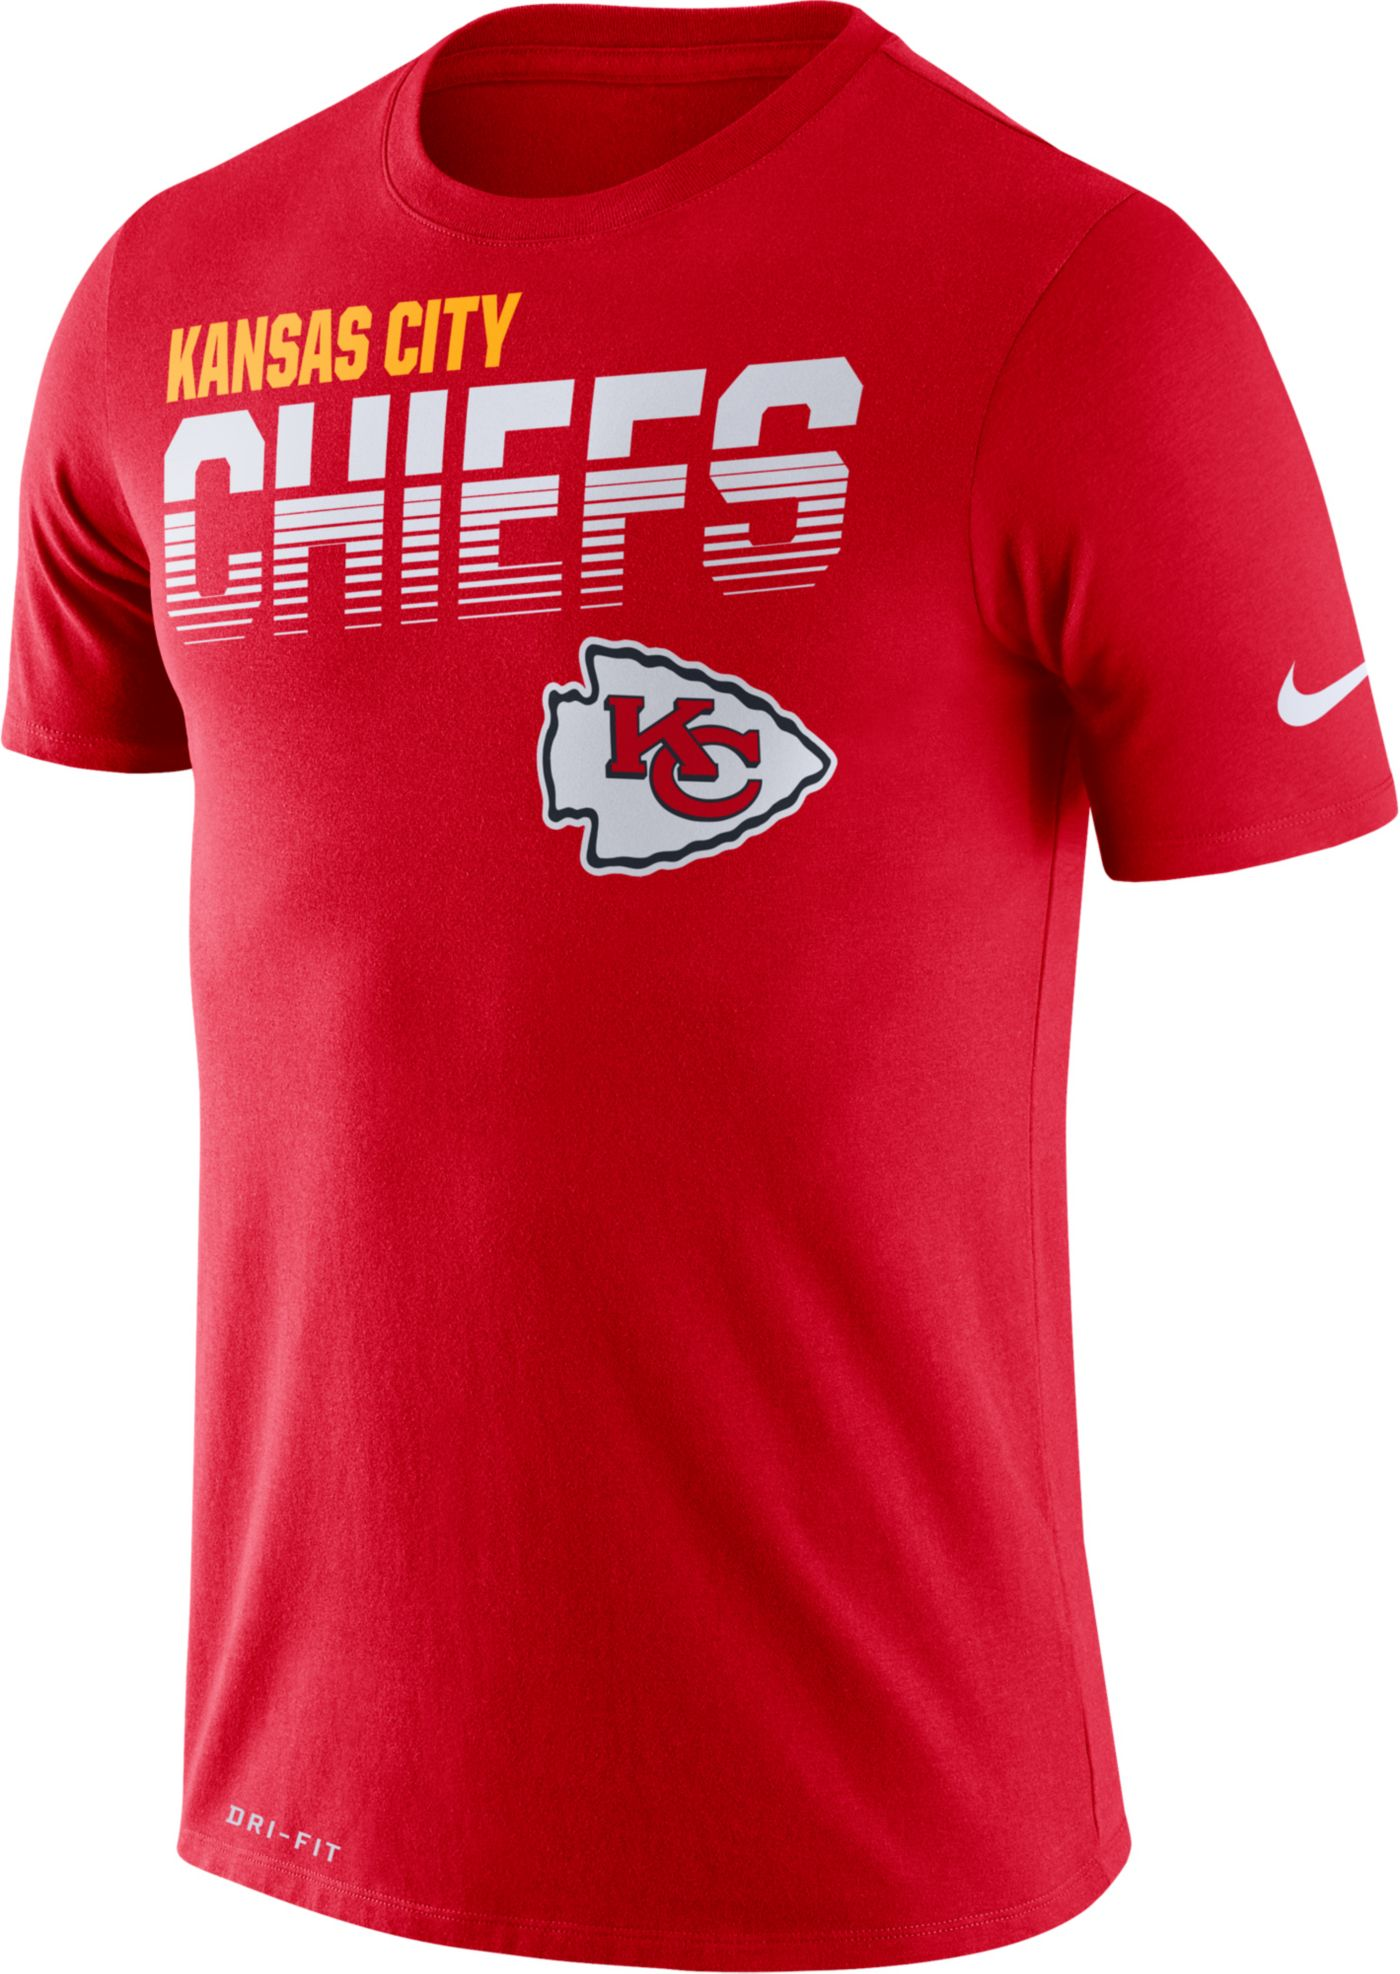 Nike Men's Kansas City Chiefs Sideline Legend Performance Red T-Shirt